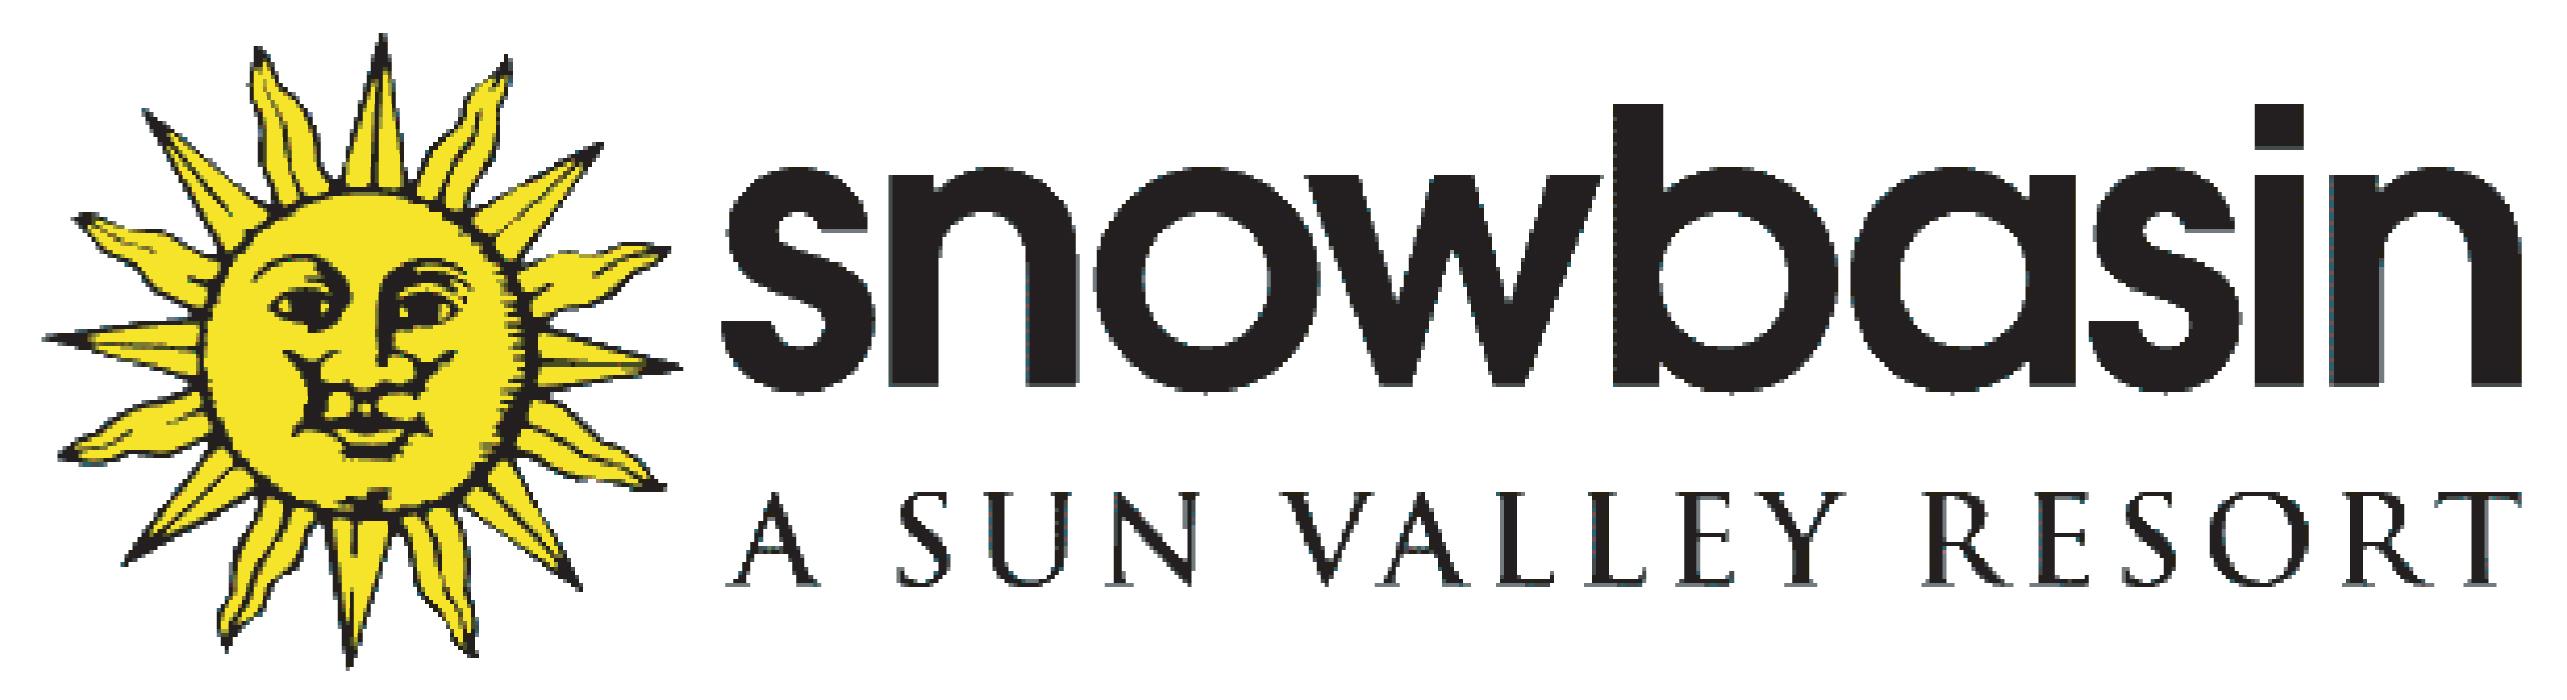 SNOWBASIside_logo_white.jpg